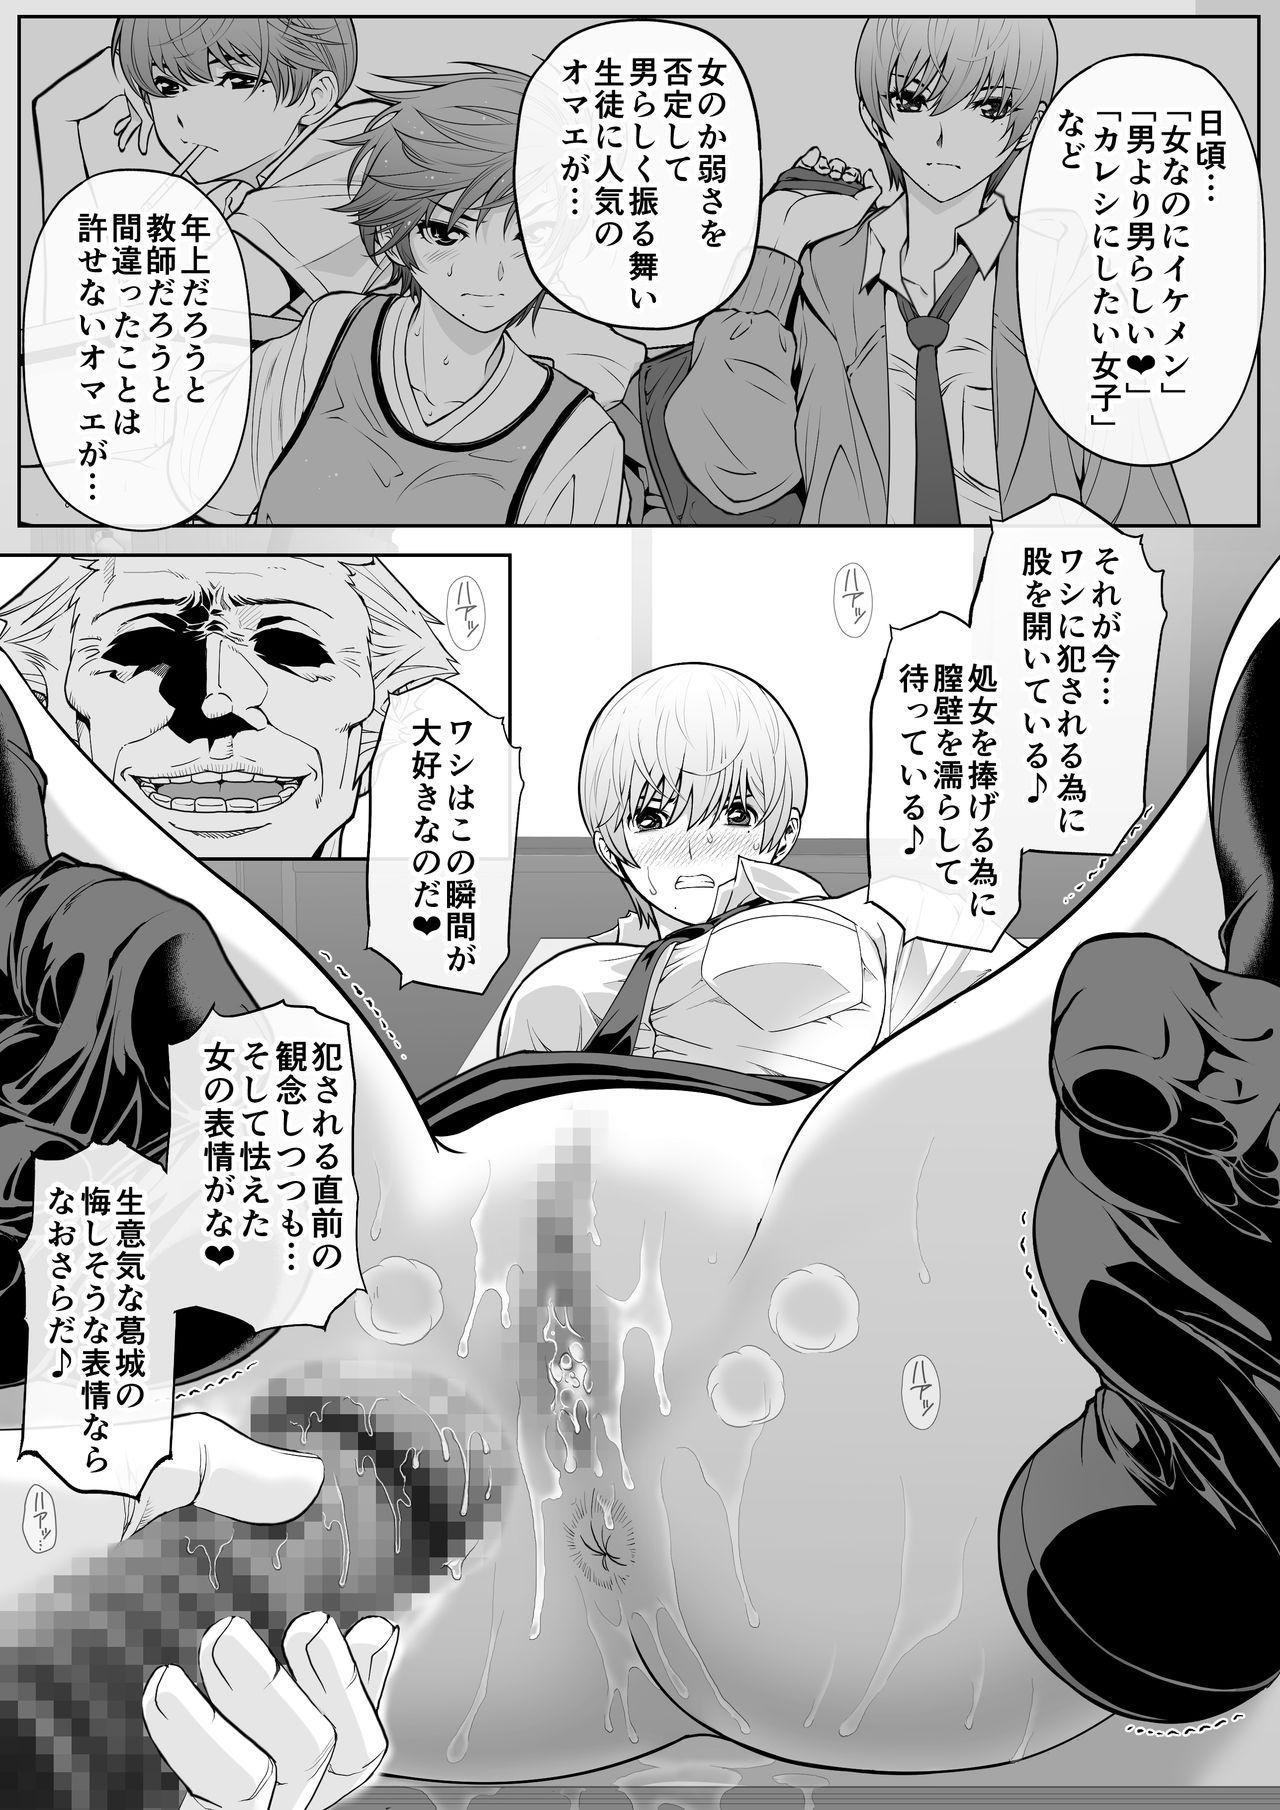 Namaiki mmusume ni tsuyo ● ikīki jugyō 37